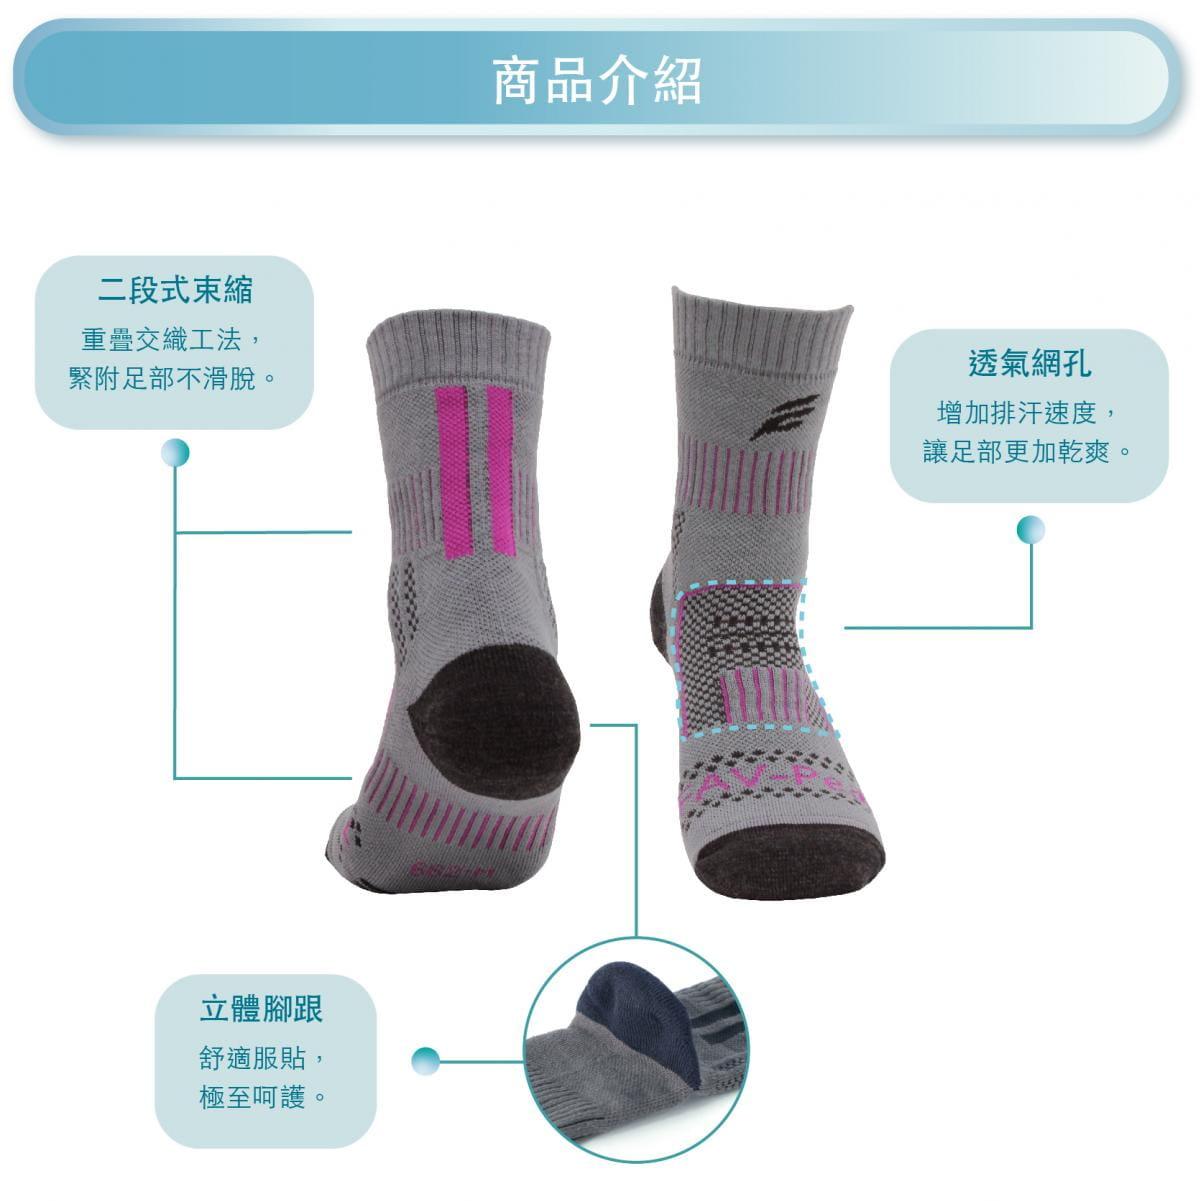 【FAV】止滑加厚保暖登山襪 2